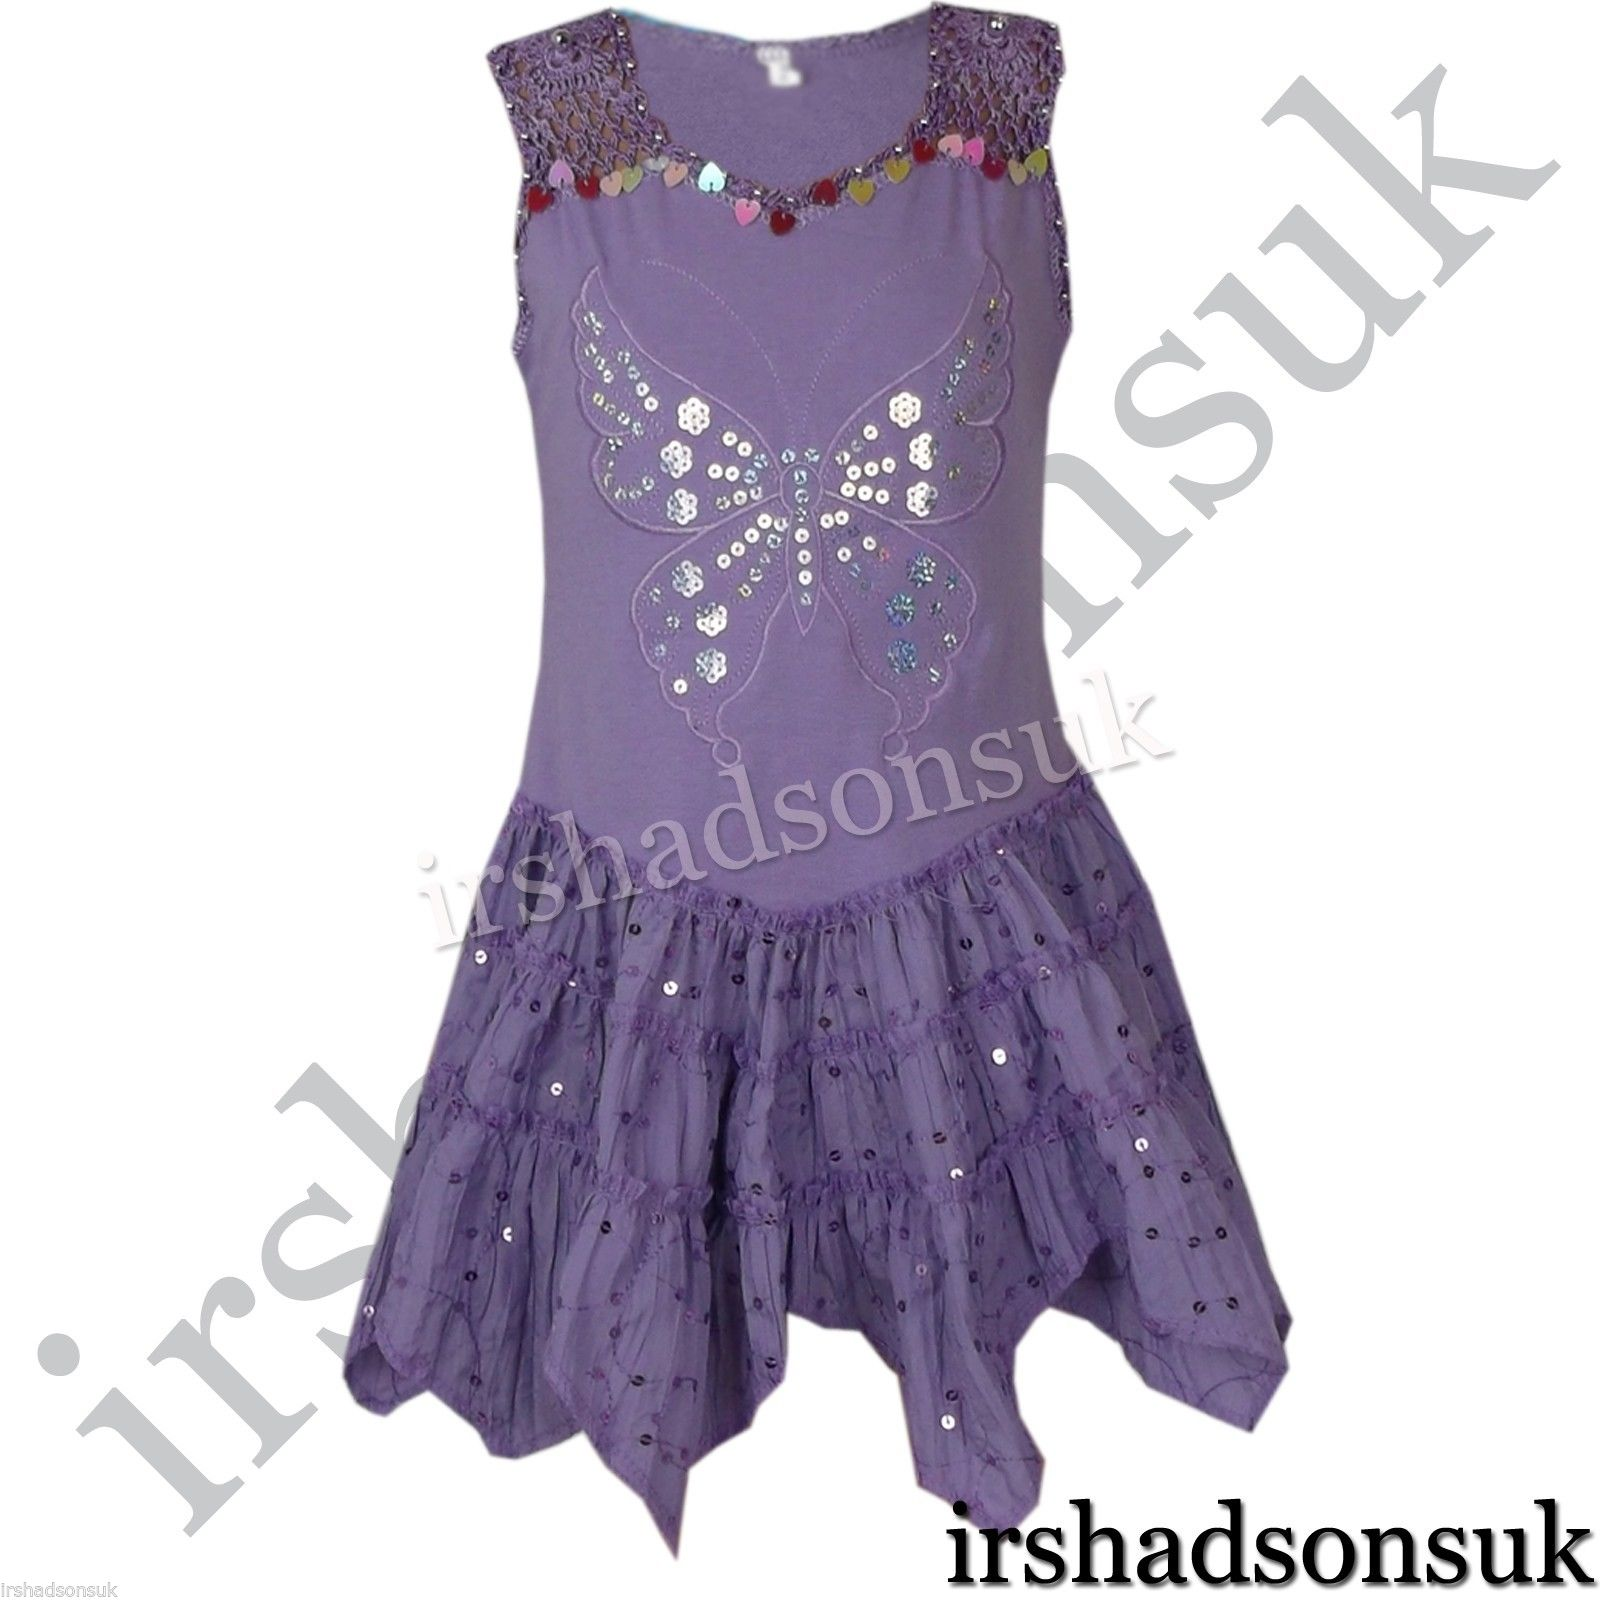 New Kids Girls Summer Dresses Sequinned Butterfly Handkerchief Dress 2-10 Years